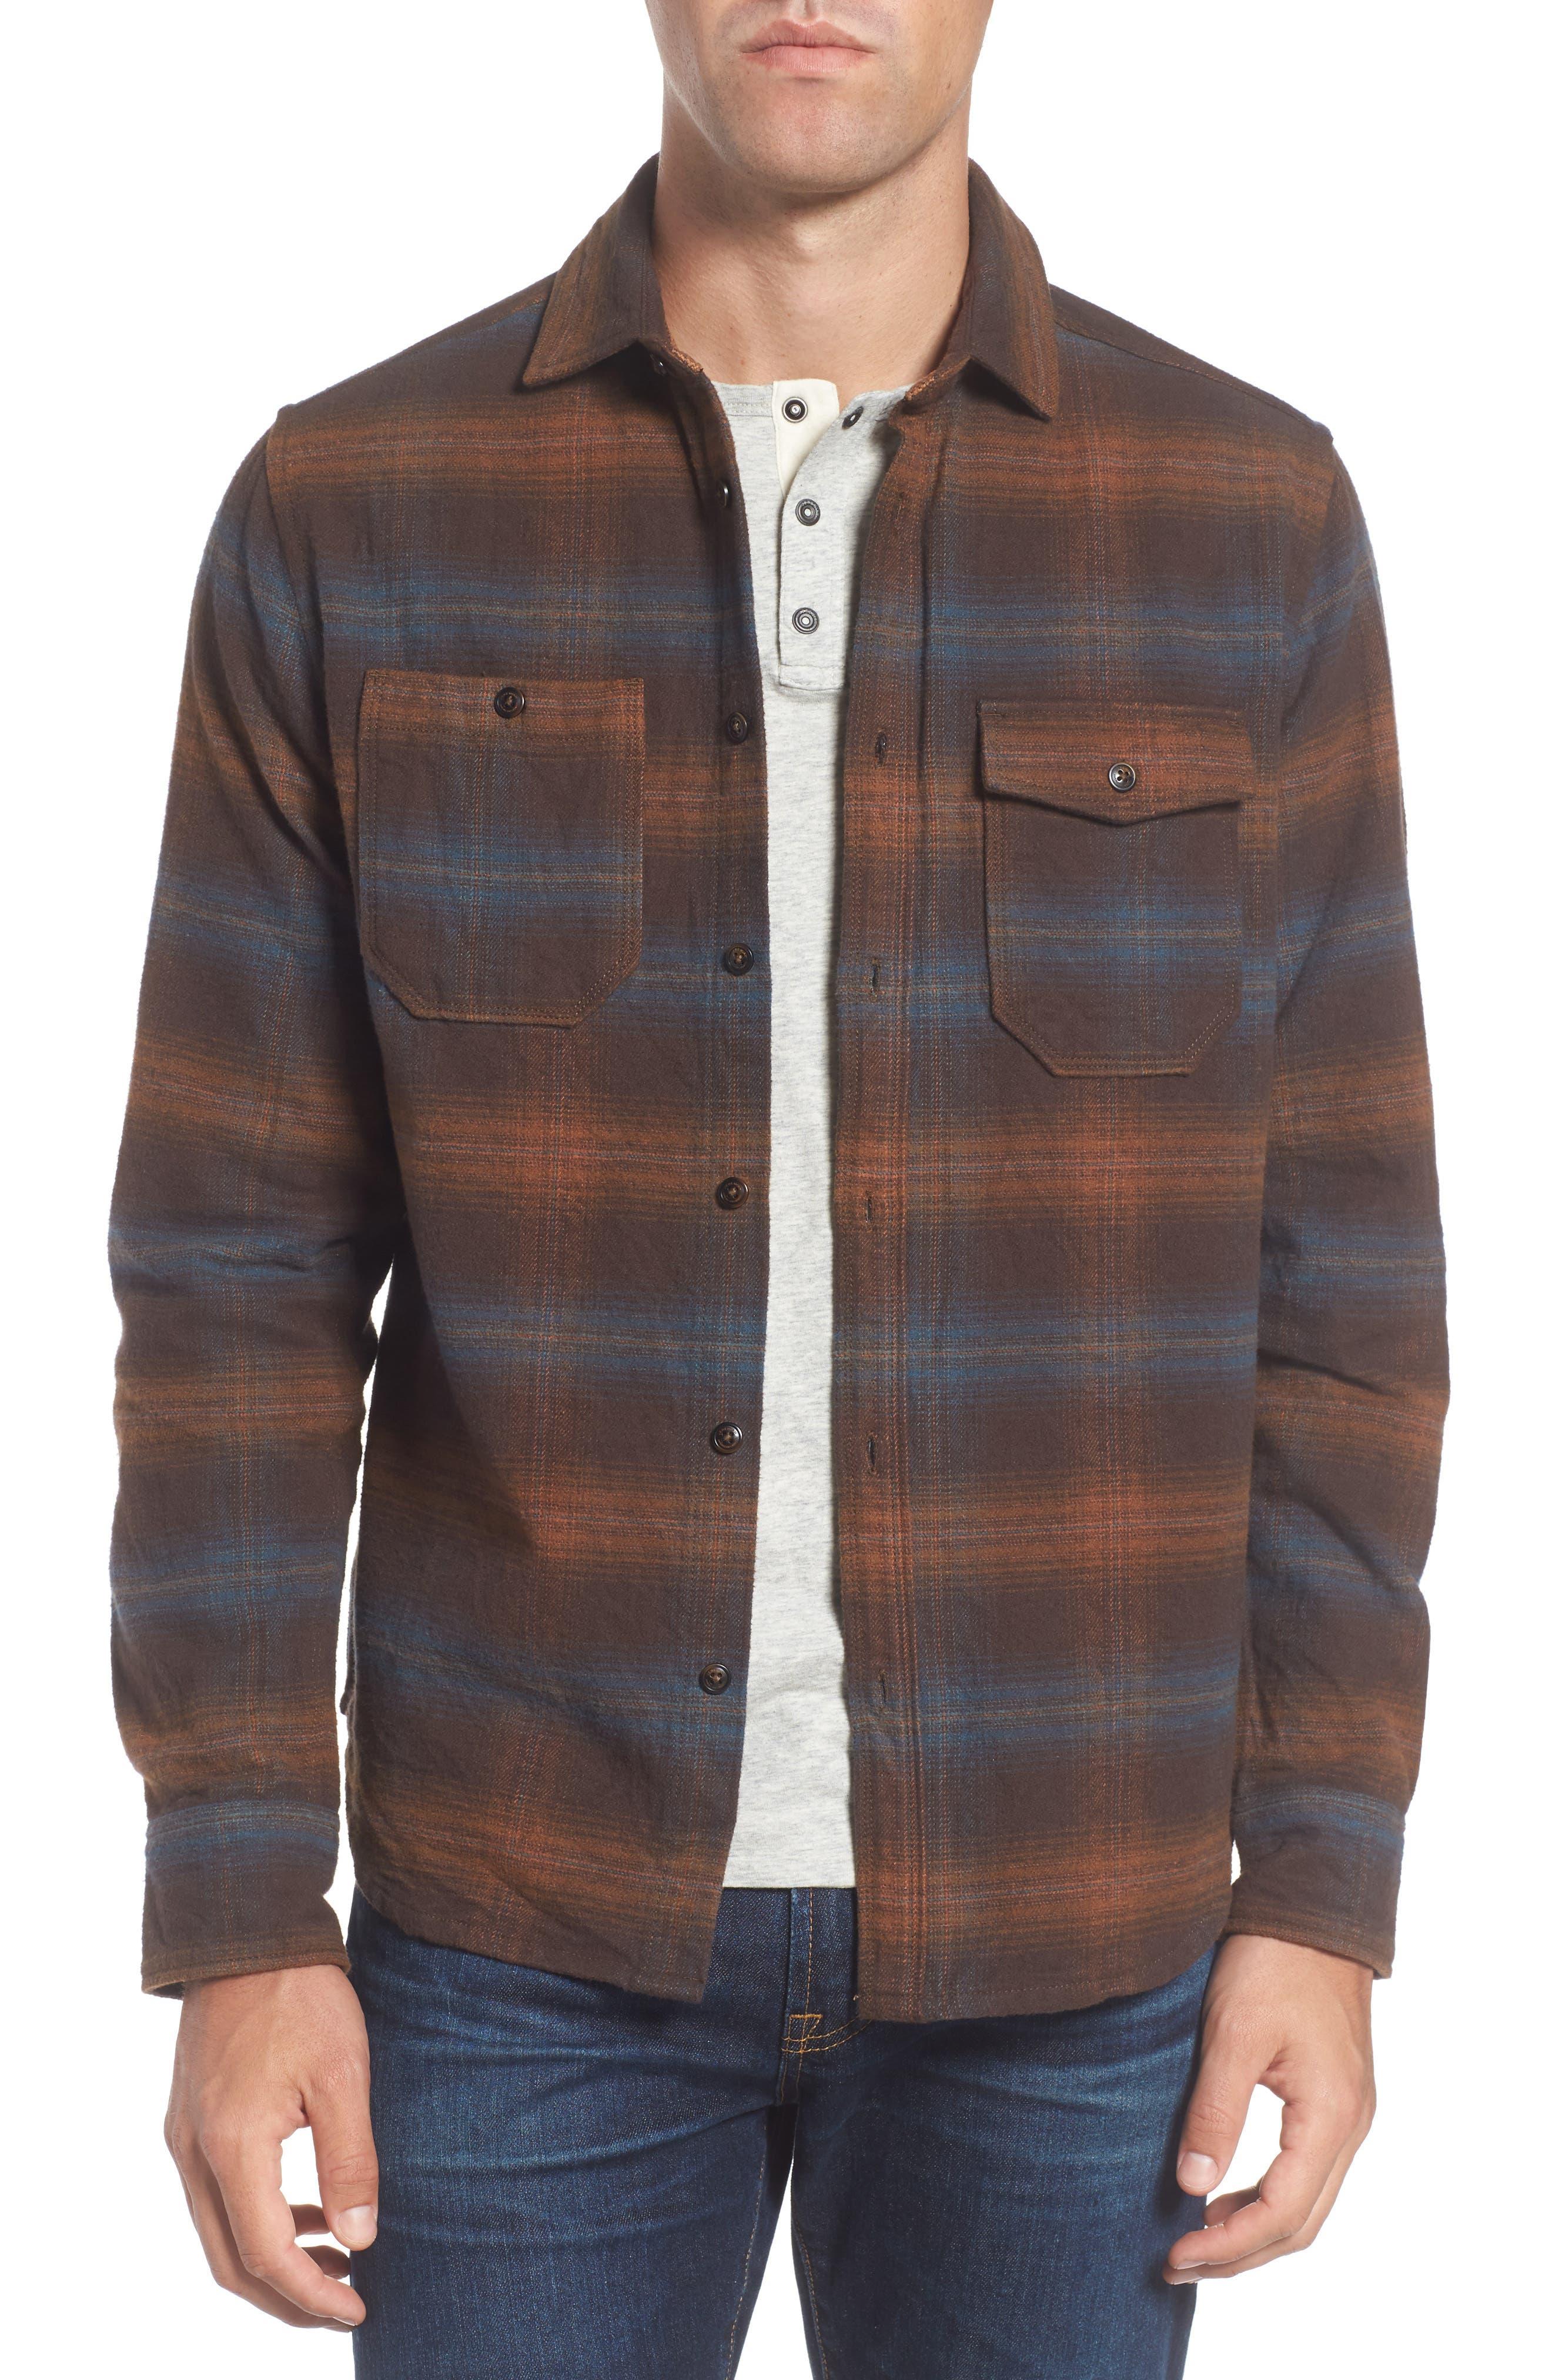 Jeremiah Canyon Plaid Brushed Twill Shirt